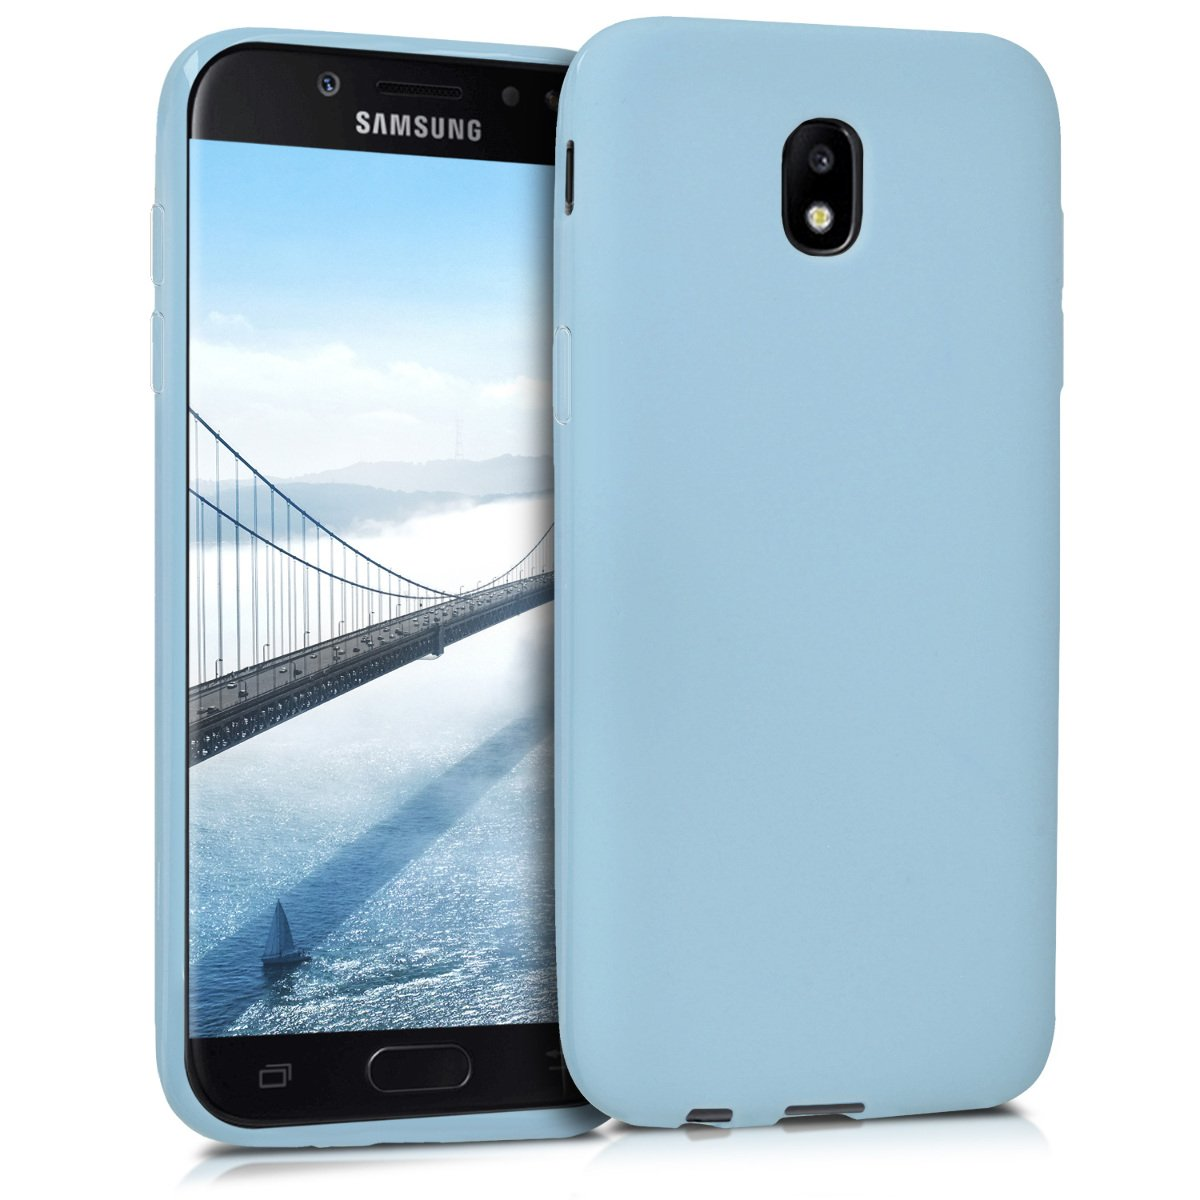 091641132cb Comprar kwmobile Funda para Samsung Galaxy J5 (2017) DUOS - Carcasa ...